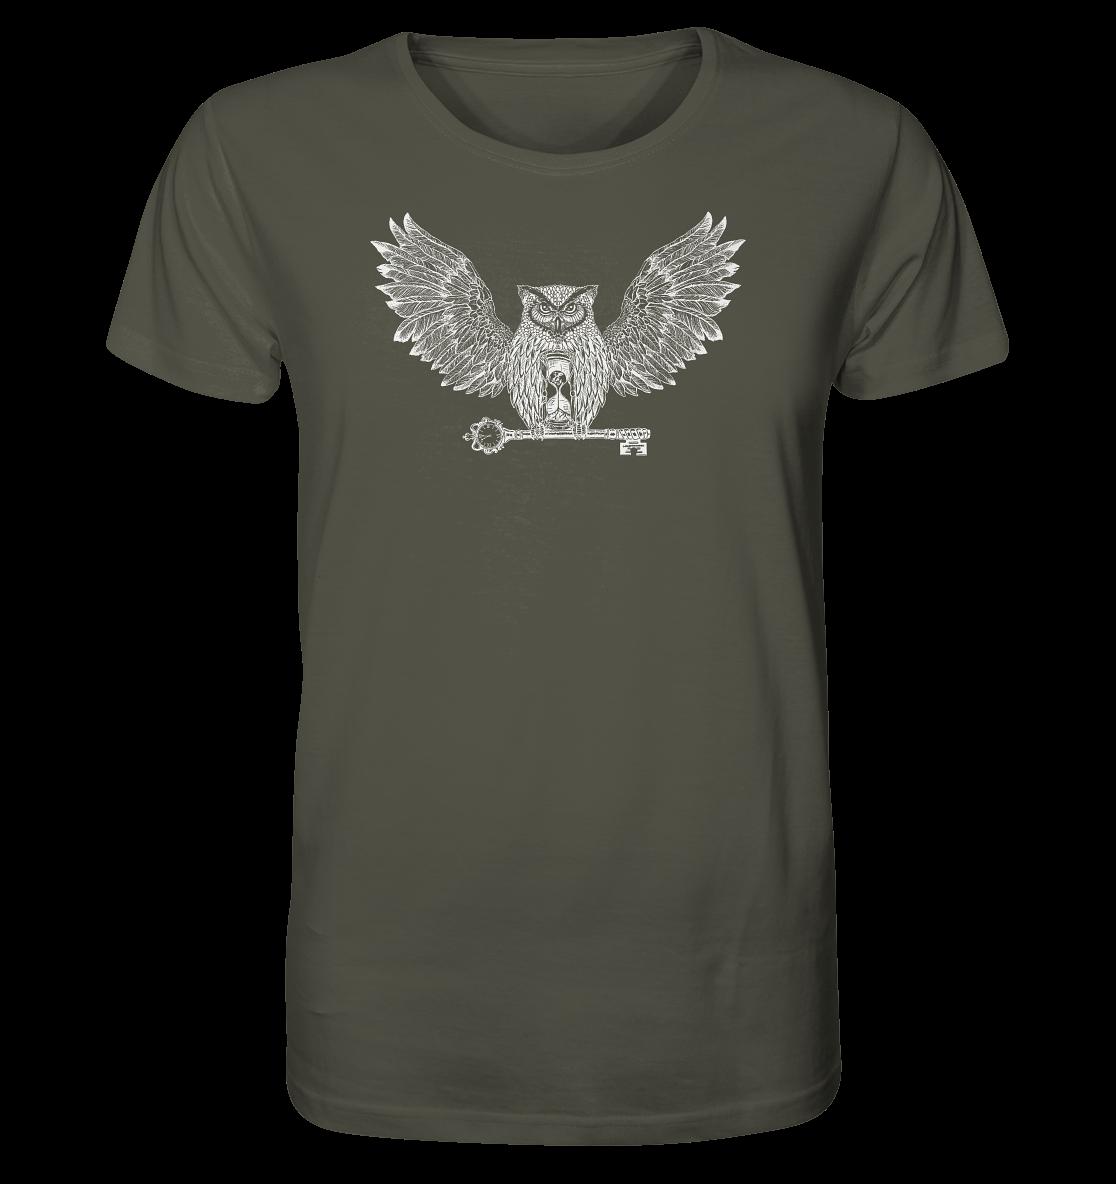 front-organic-shirt-545348-1116x-4.png